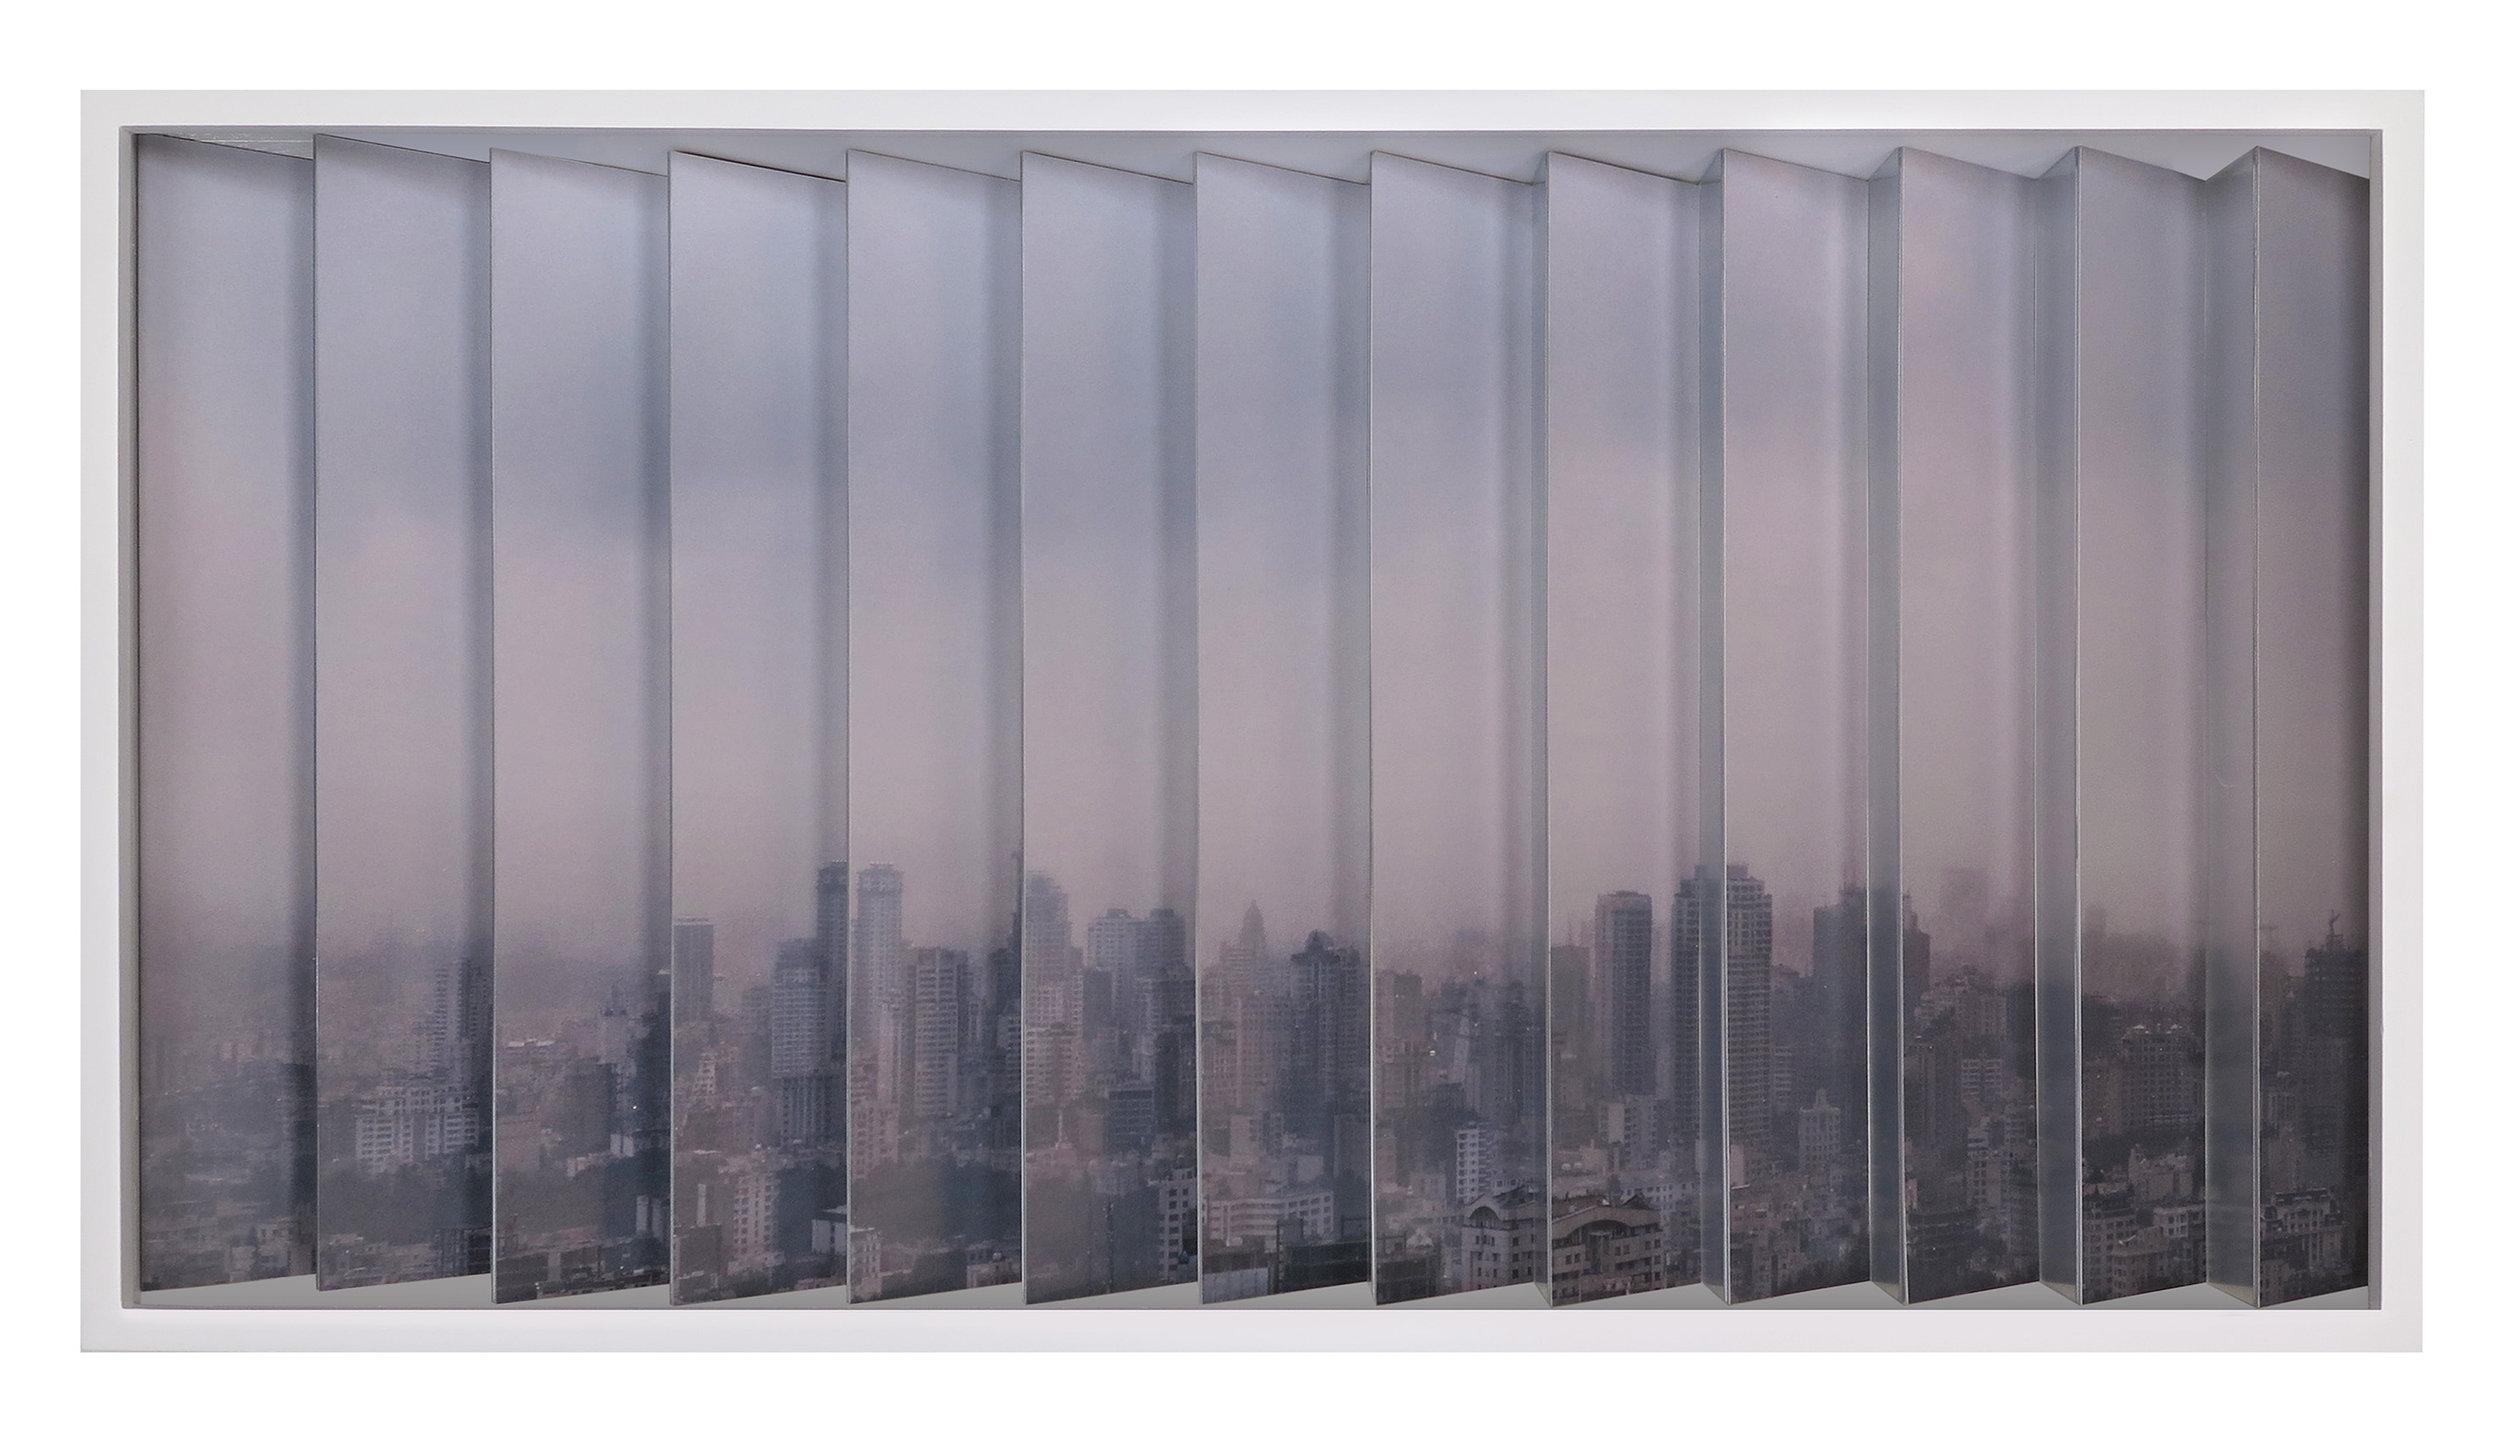 Setare Sanjani, Untitled,50x91x5 cm, Mixed Media (Photo and mirror).jpeg